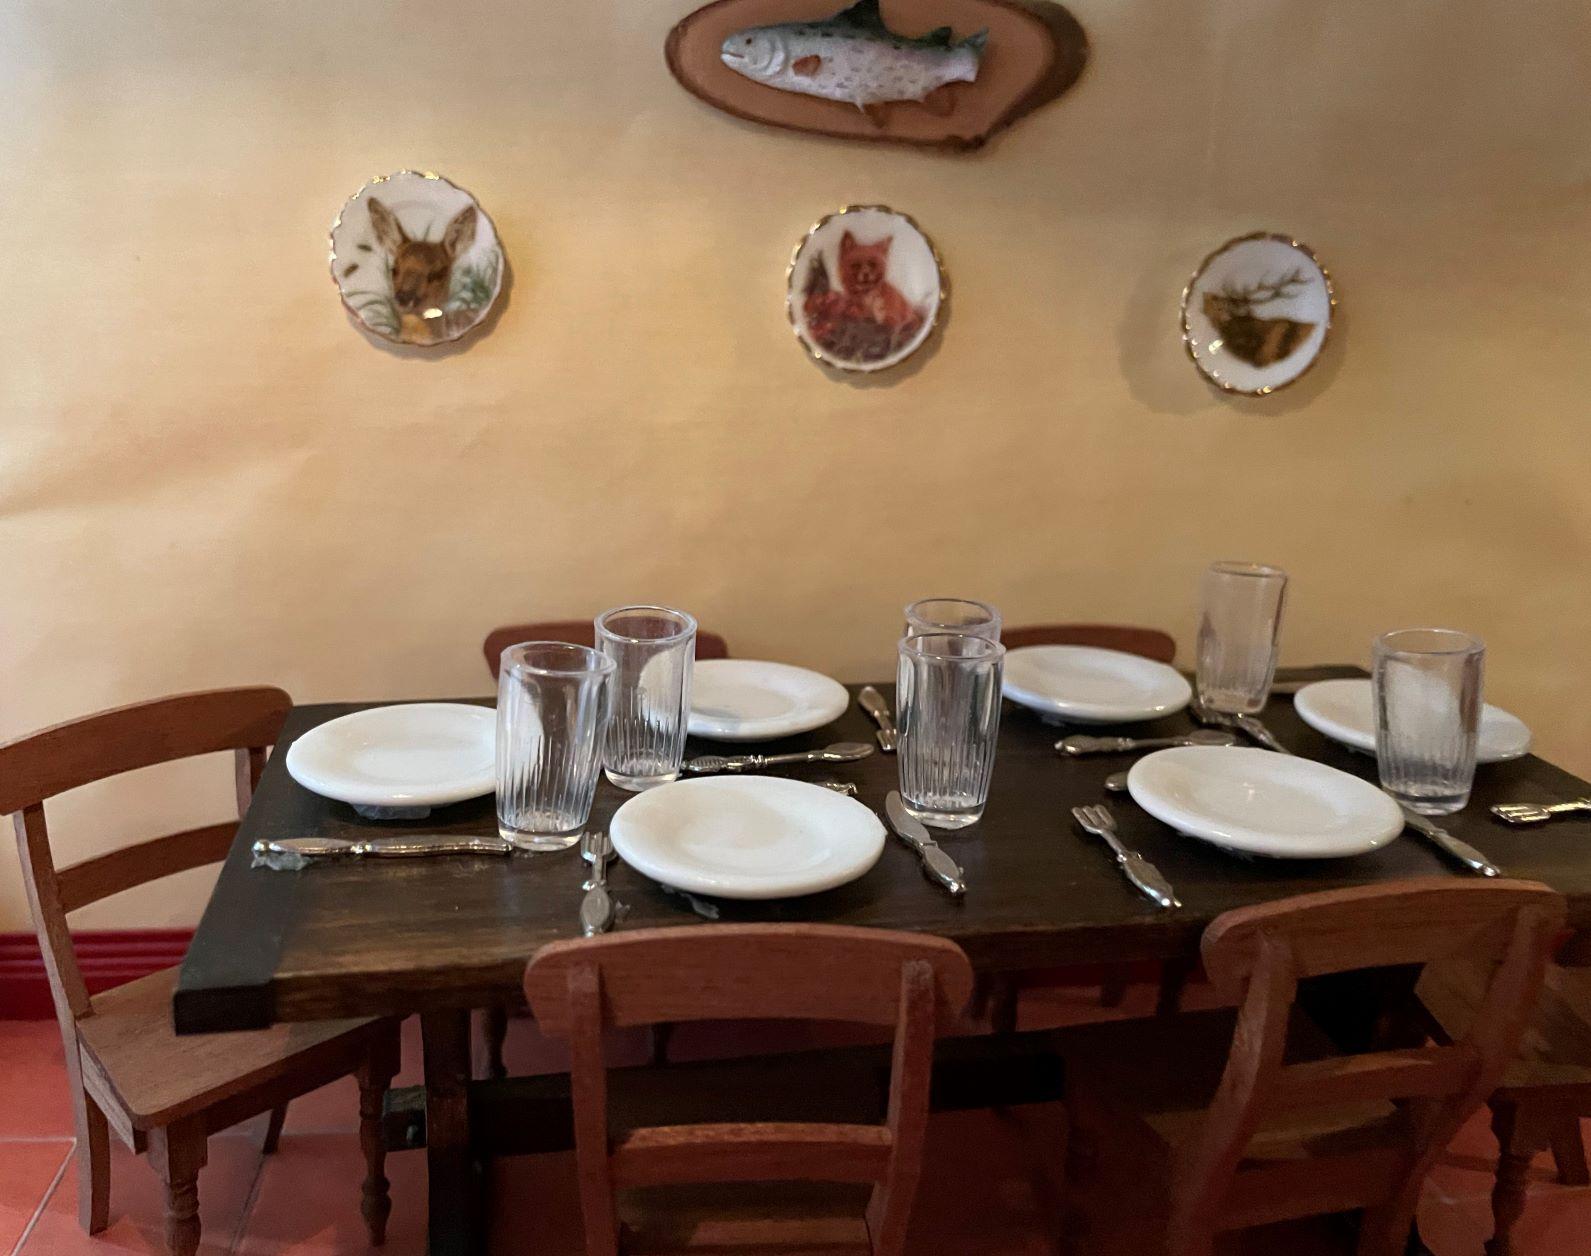 Servants' Dining Table